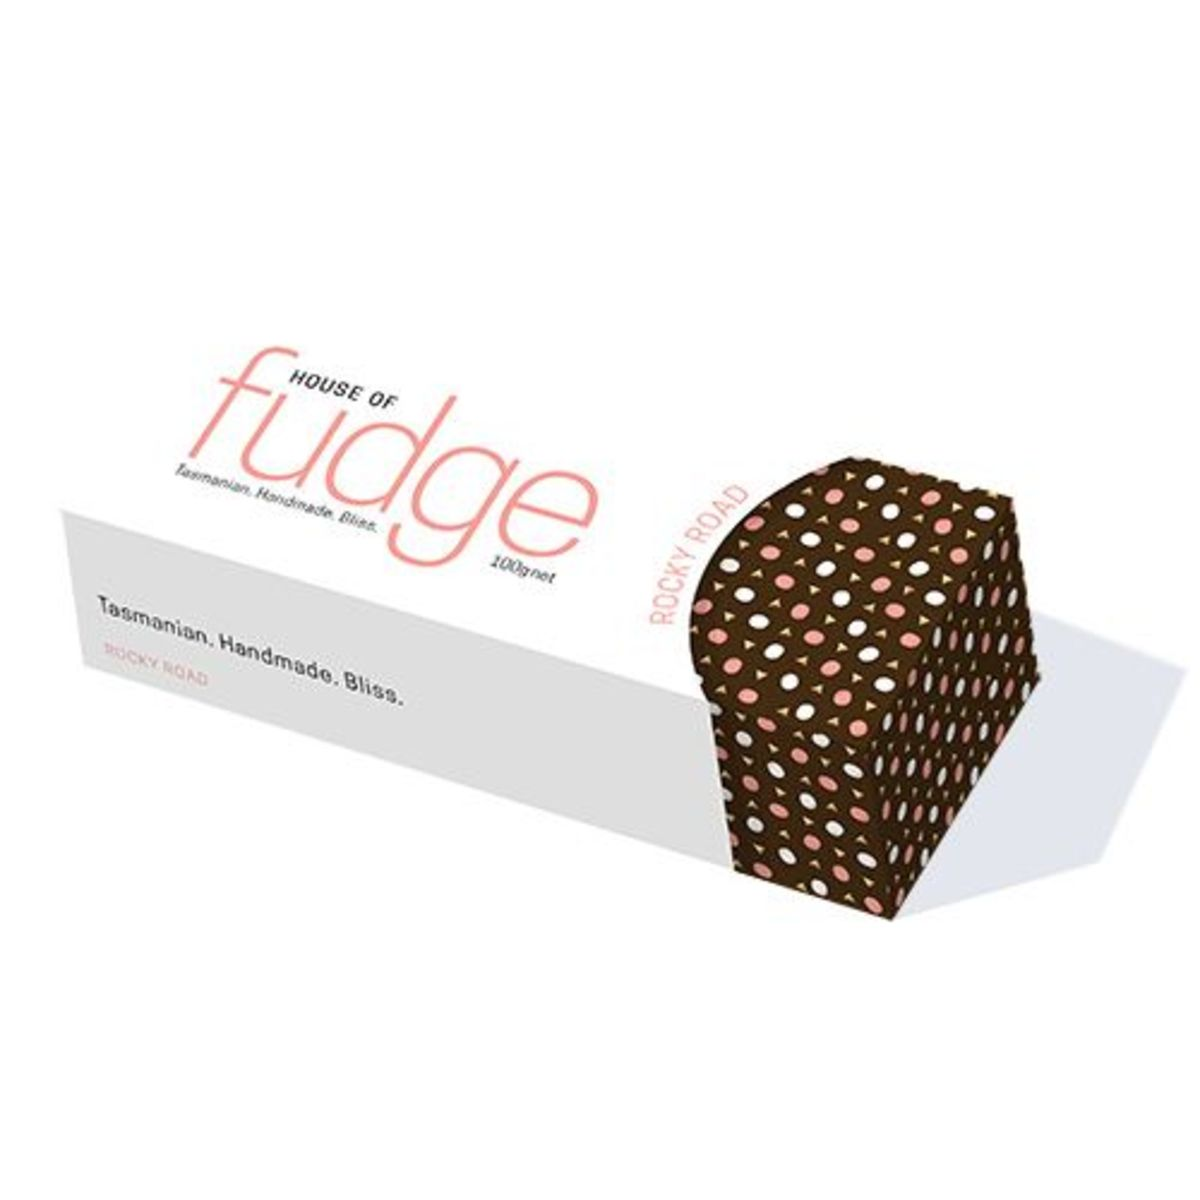 House of Fudge - Rocky Road Fudge